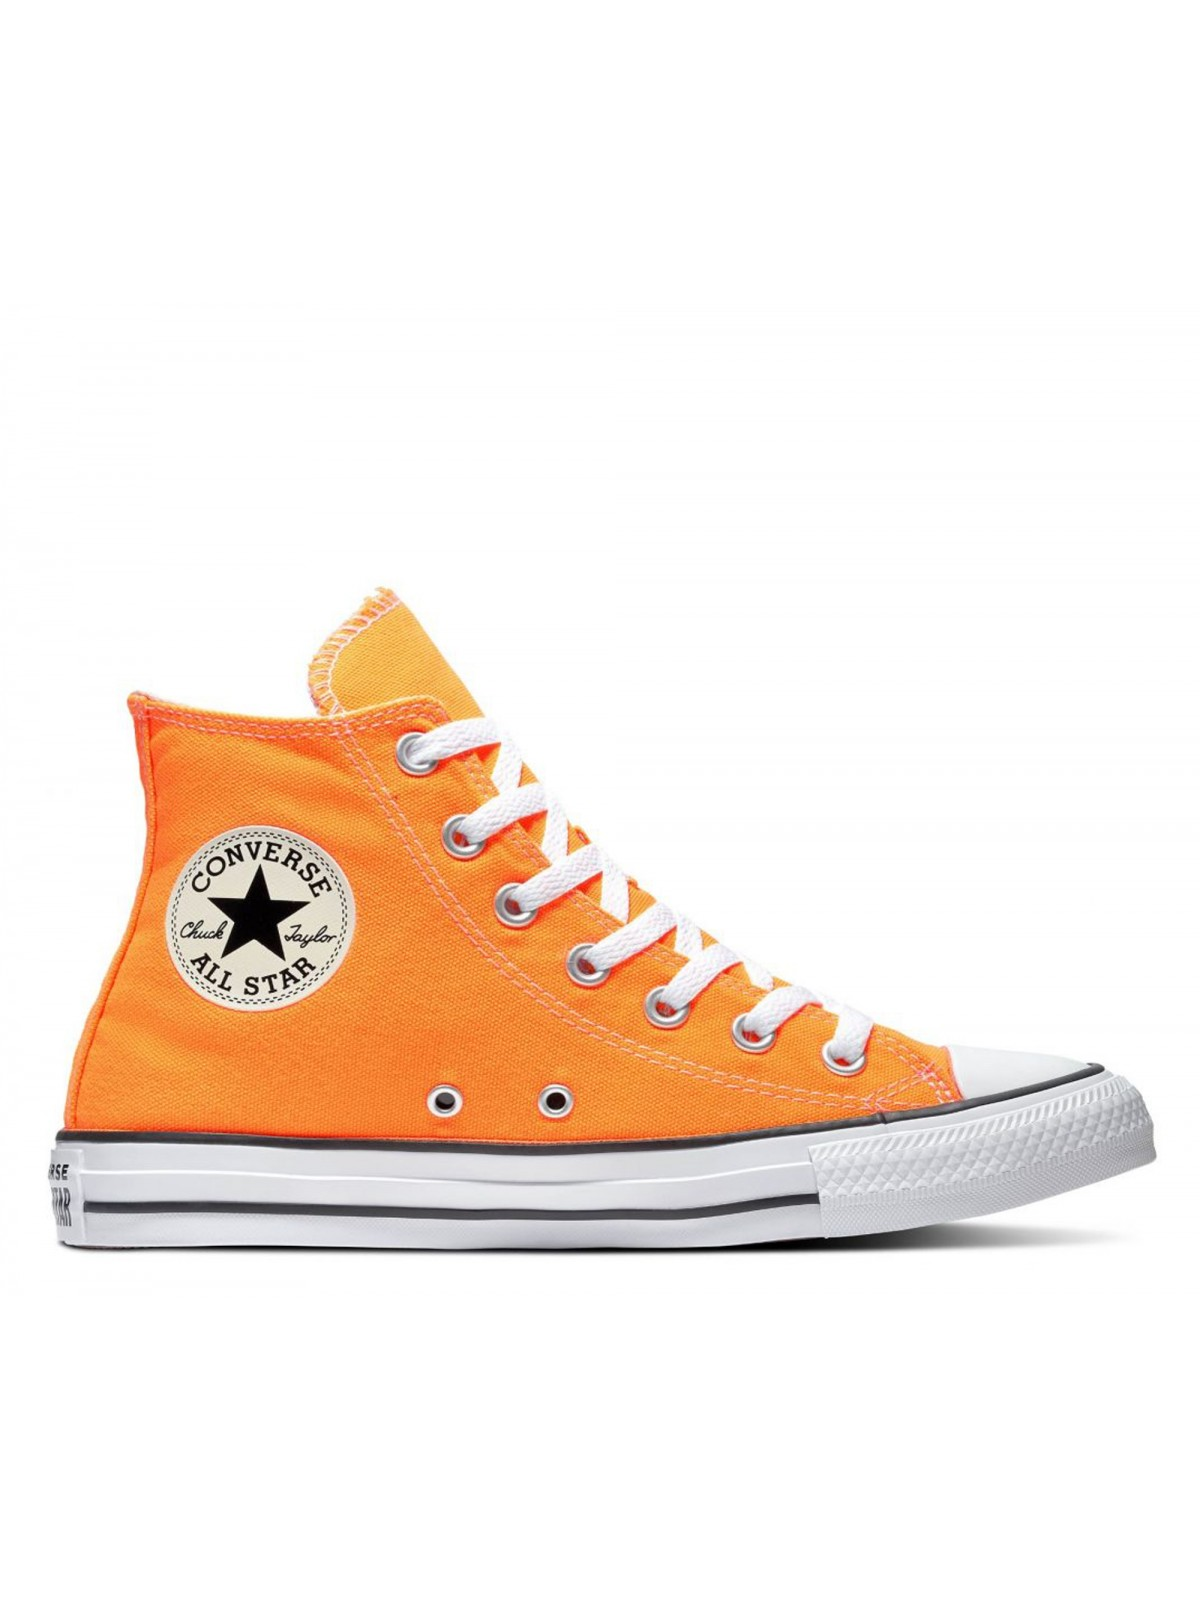 Converse Chuck Taylor all star toile Laser orange